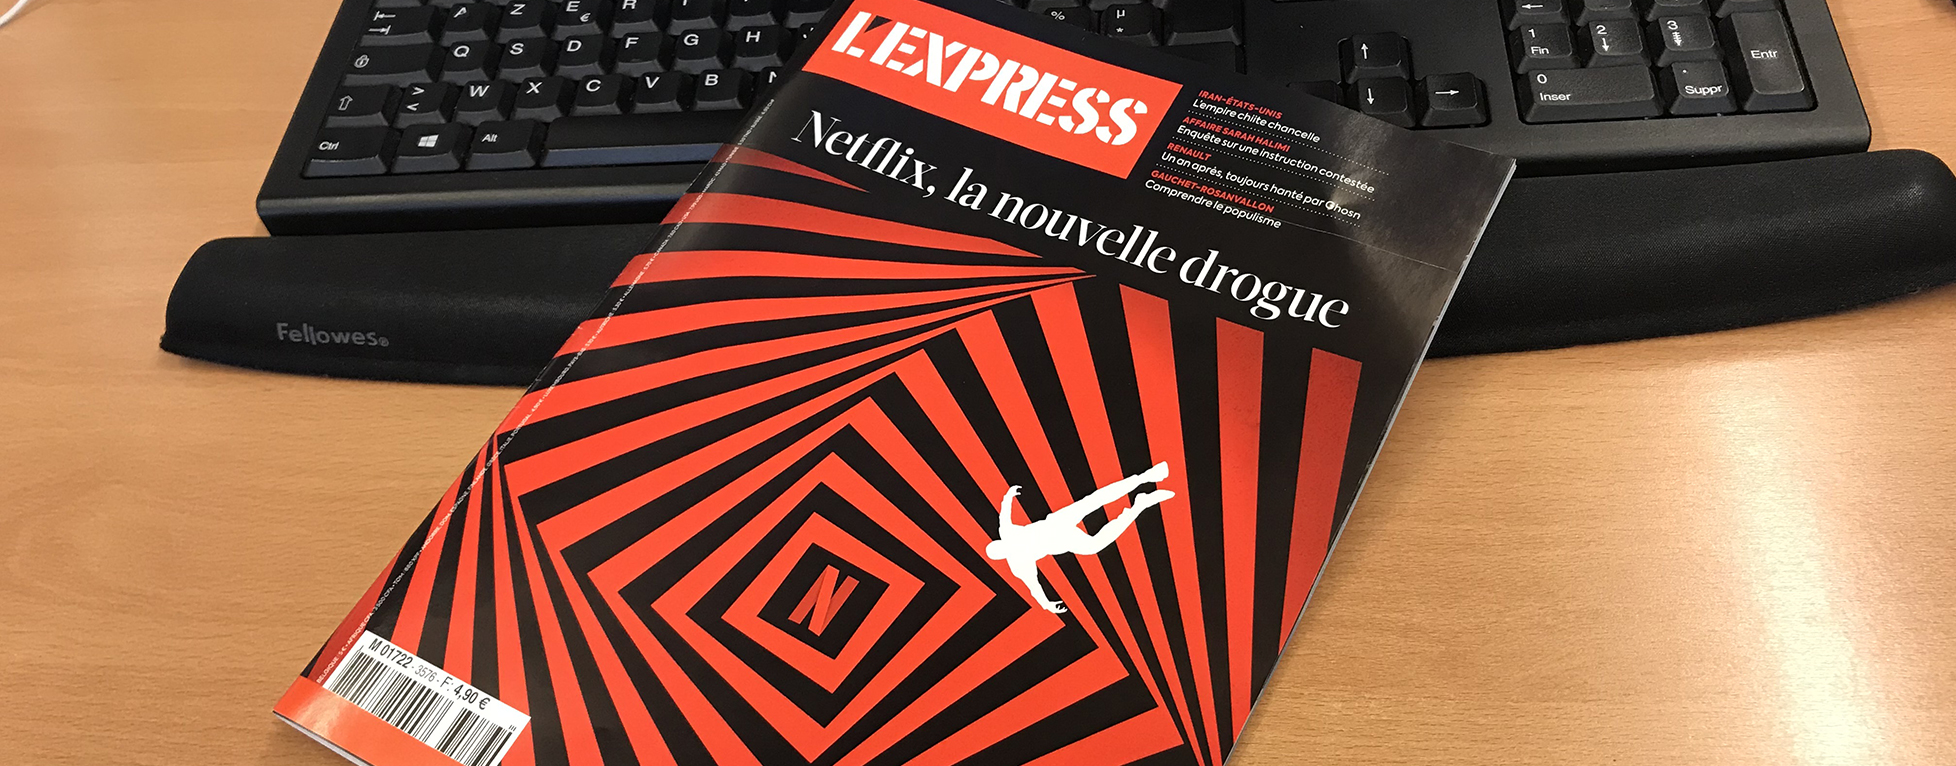 L'Express se relance aujourd'hui !